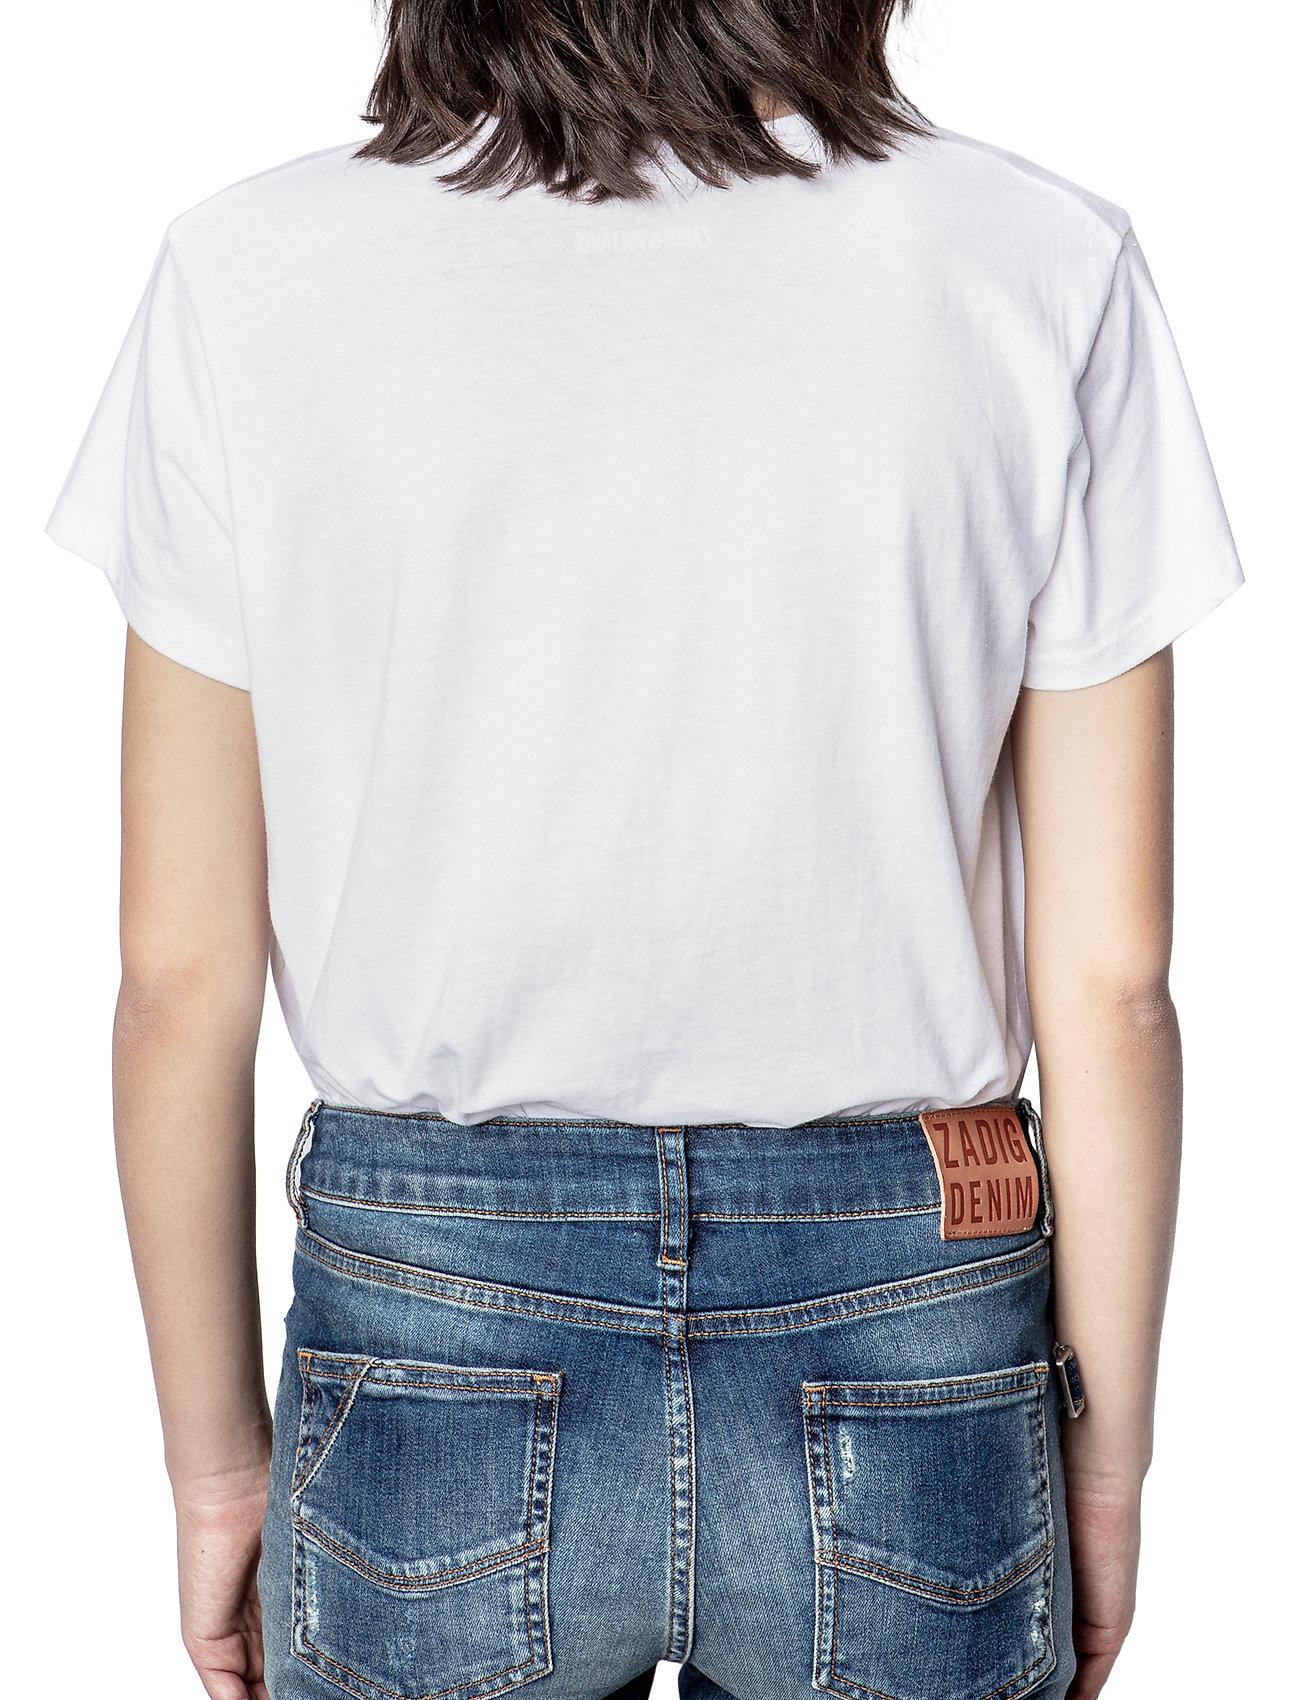 Zadig & Voltaire - ZOE SKULL VOLTAIRE COTTON T-SHIRT PRINT/ EMBROIDER - t-shirts - white - 4